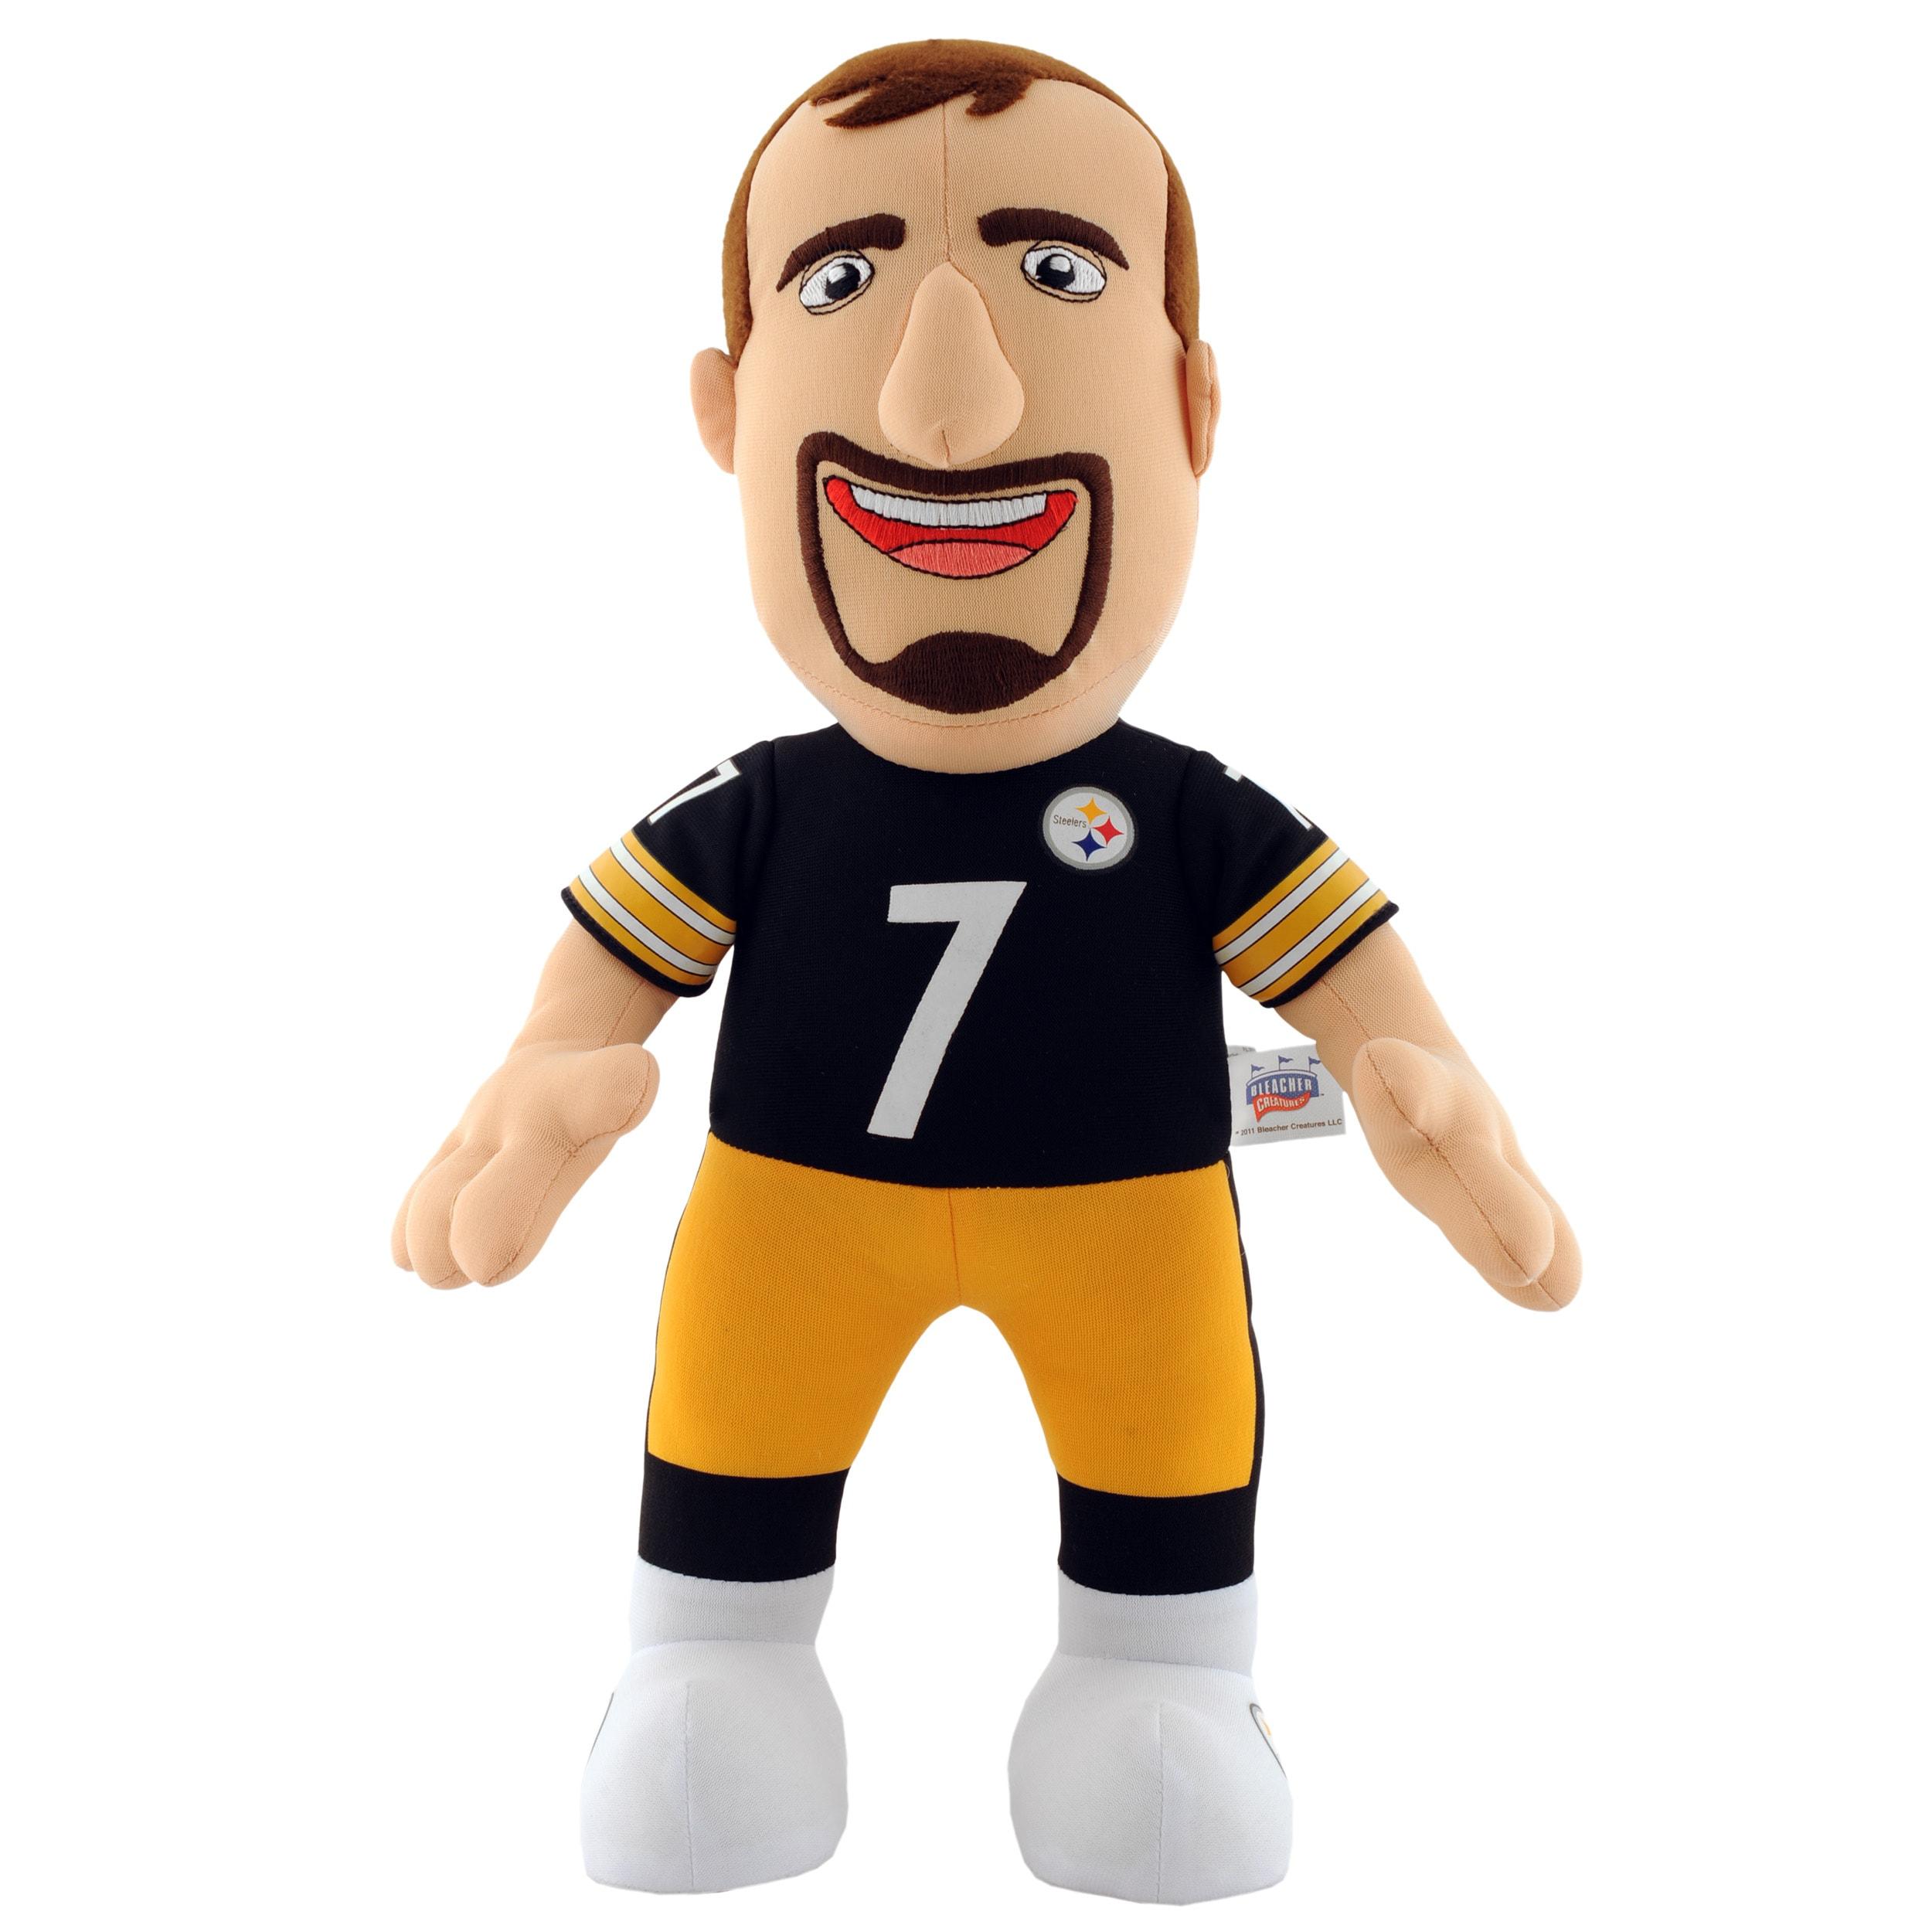 Pittsburgh Steelers Ben Roethlisberger 14-inch Plush Doll